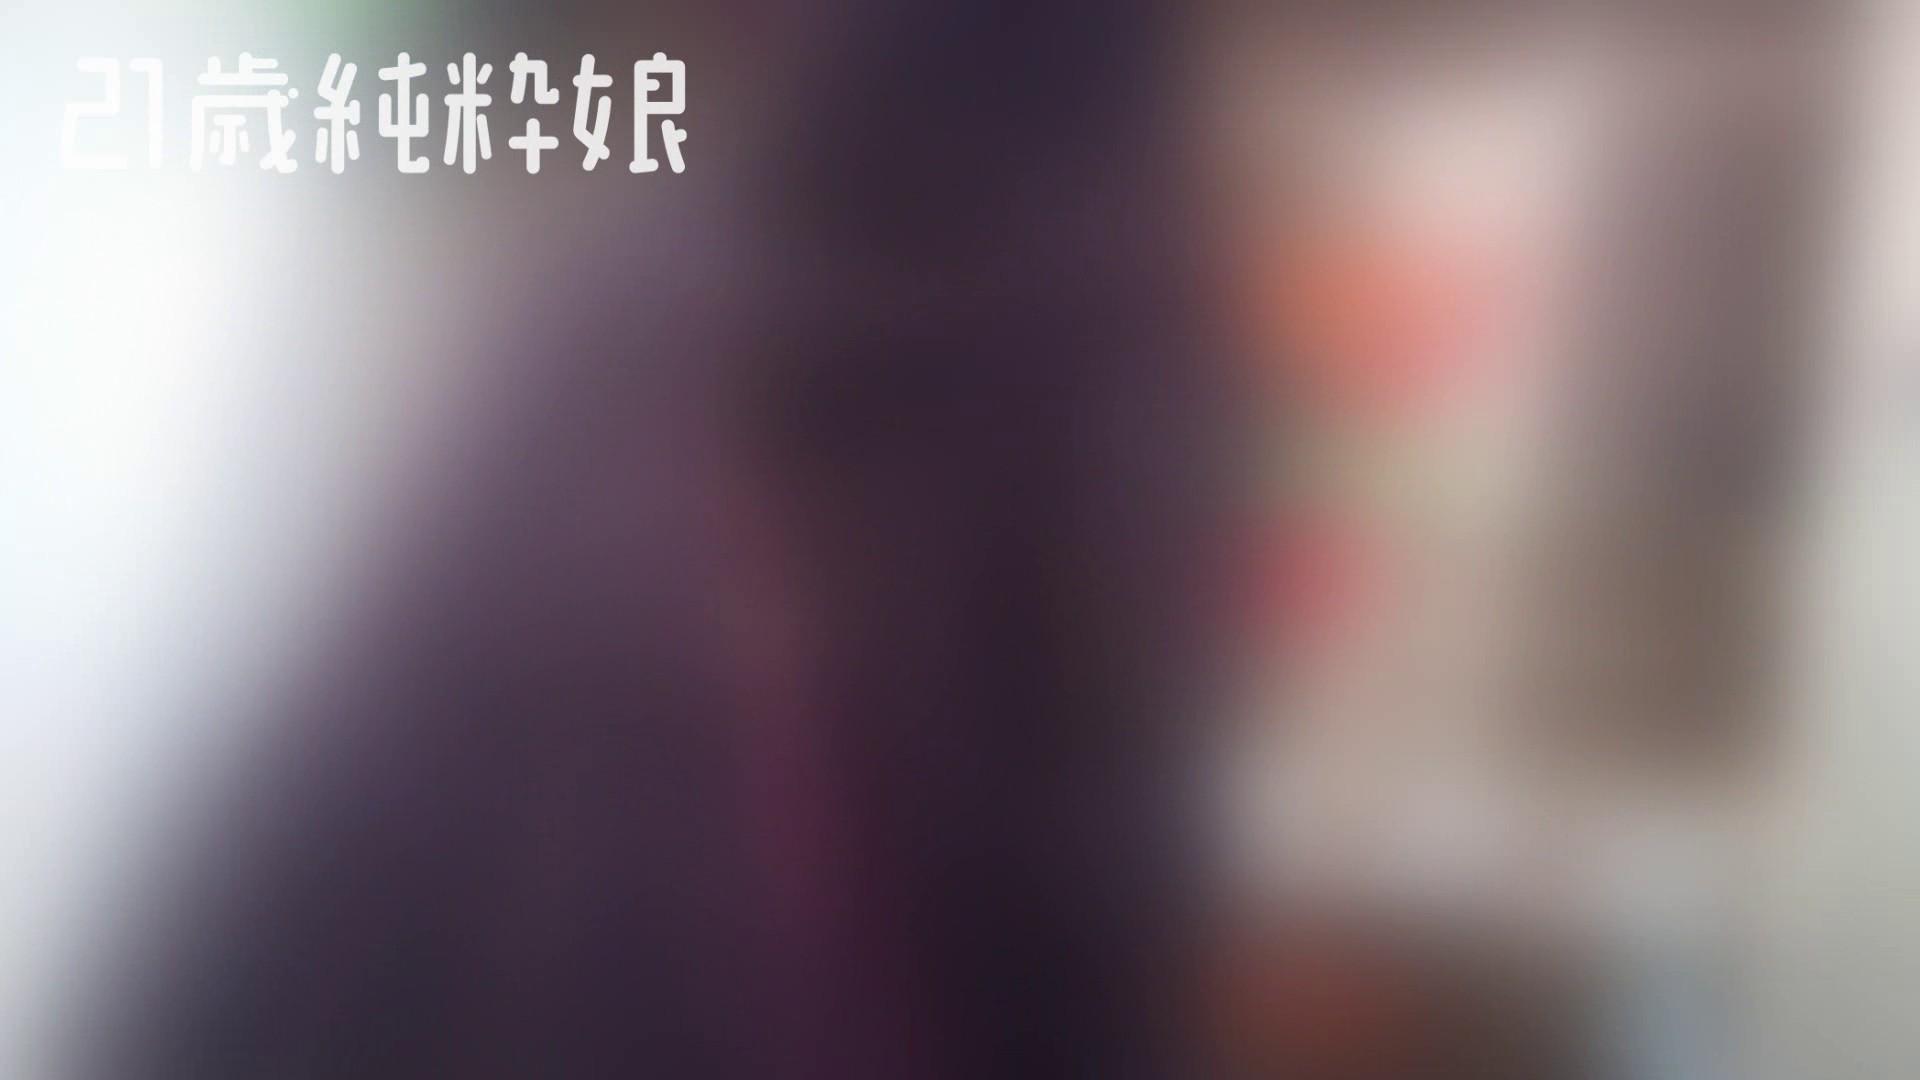 Gカップ21歳純粋嬢第2弾Vol.5 性欲丸出し | 学校  101pic 5